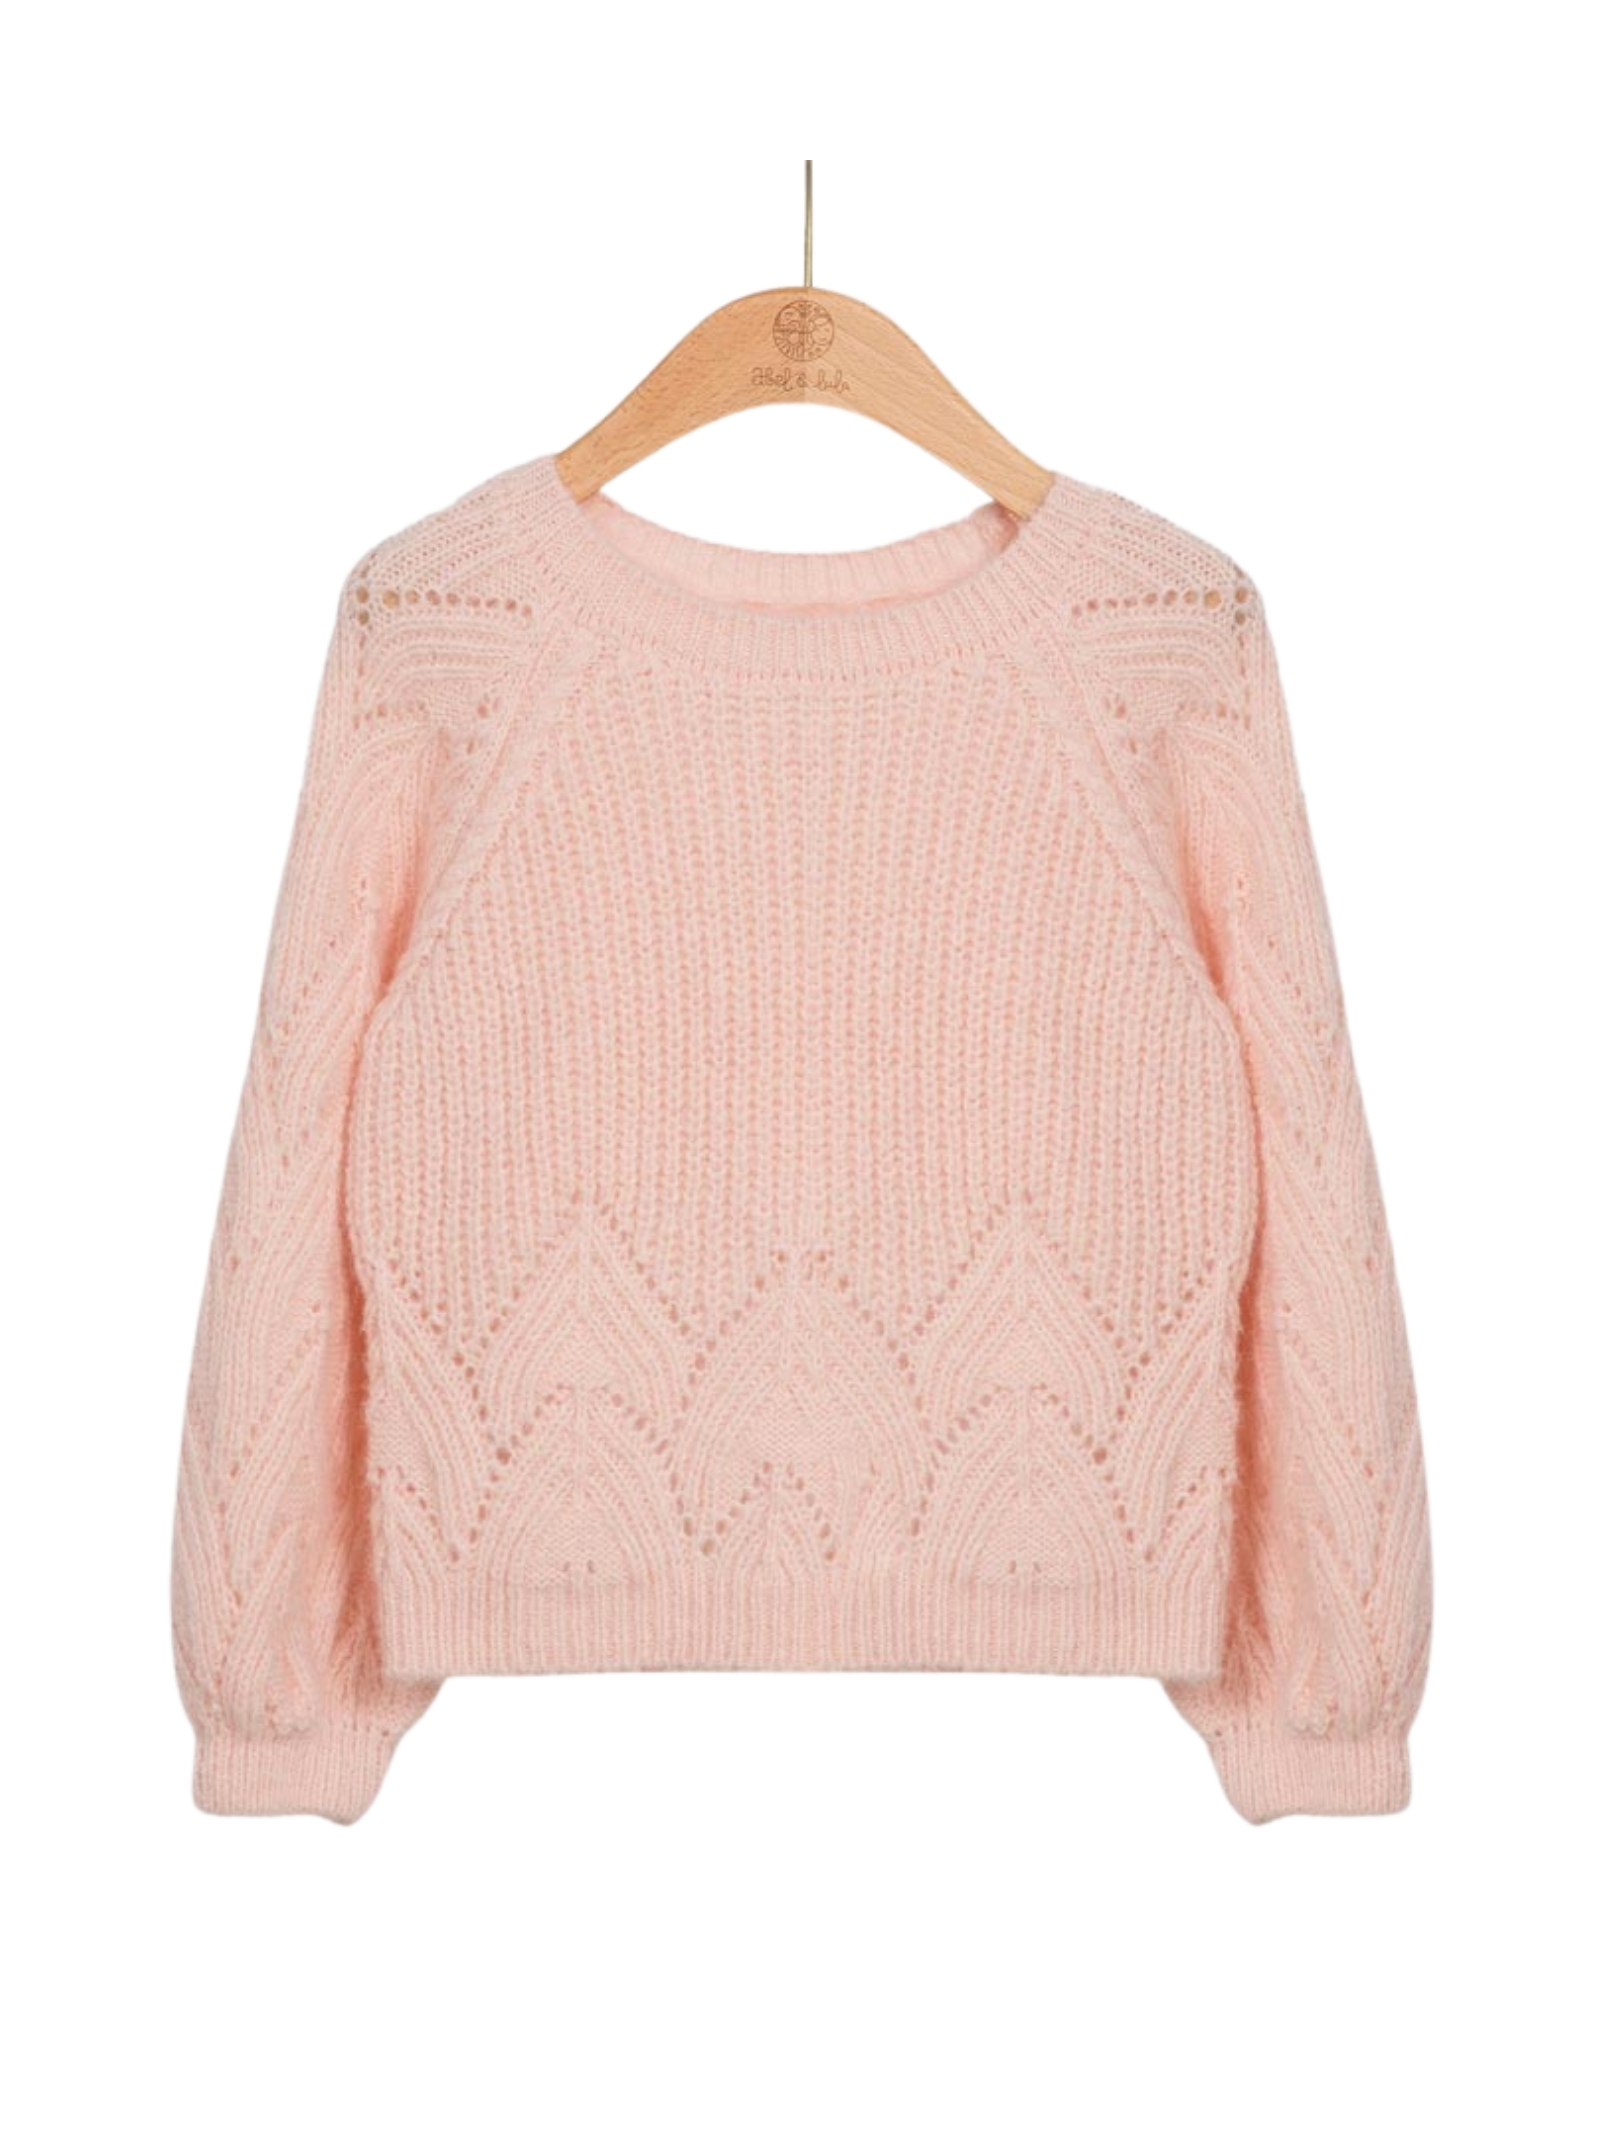 Streech Girl Sweater ABEL&LULA | Sweaters | 5835038